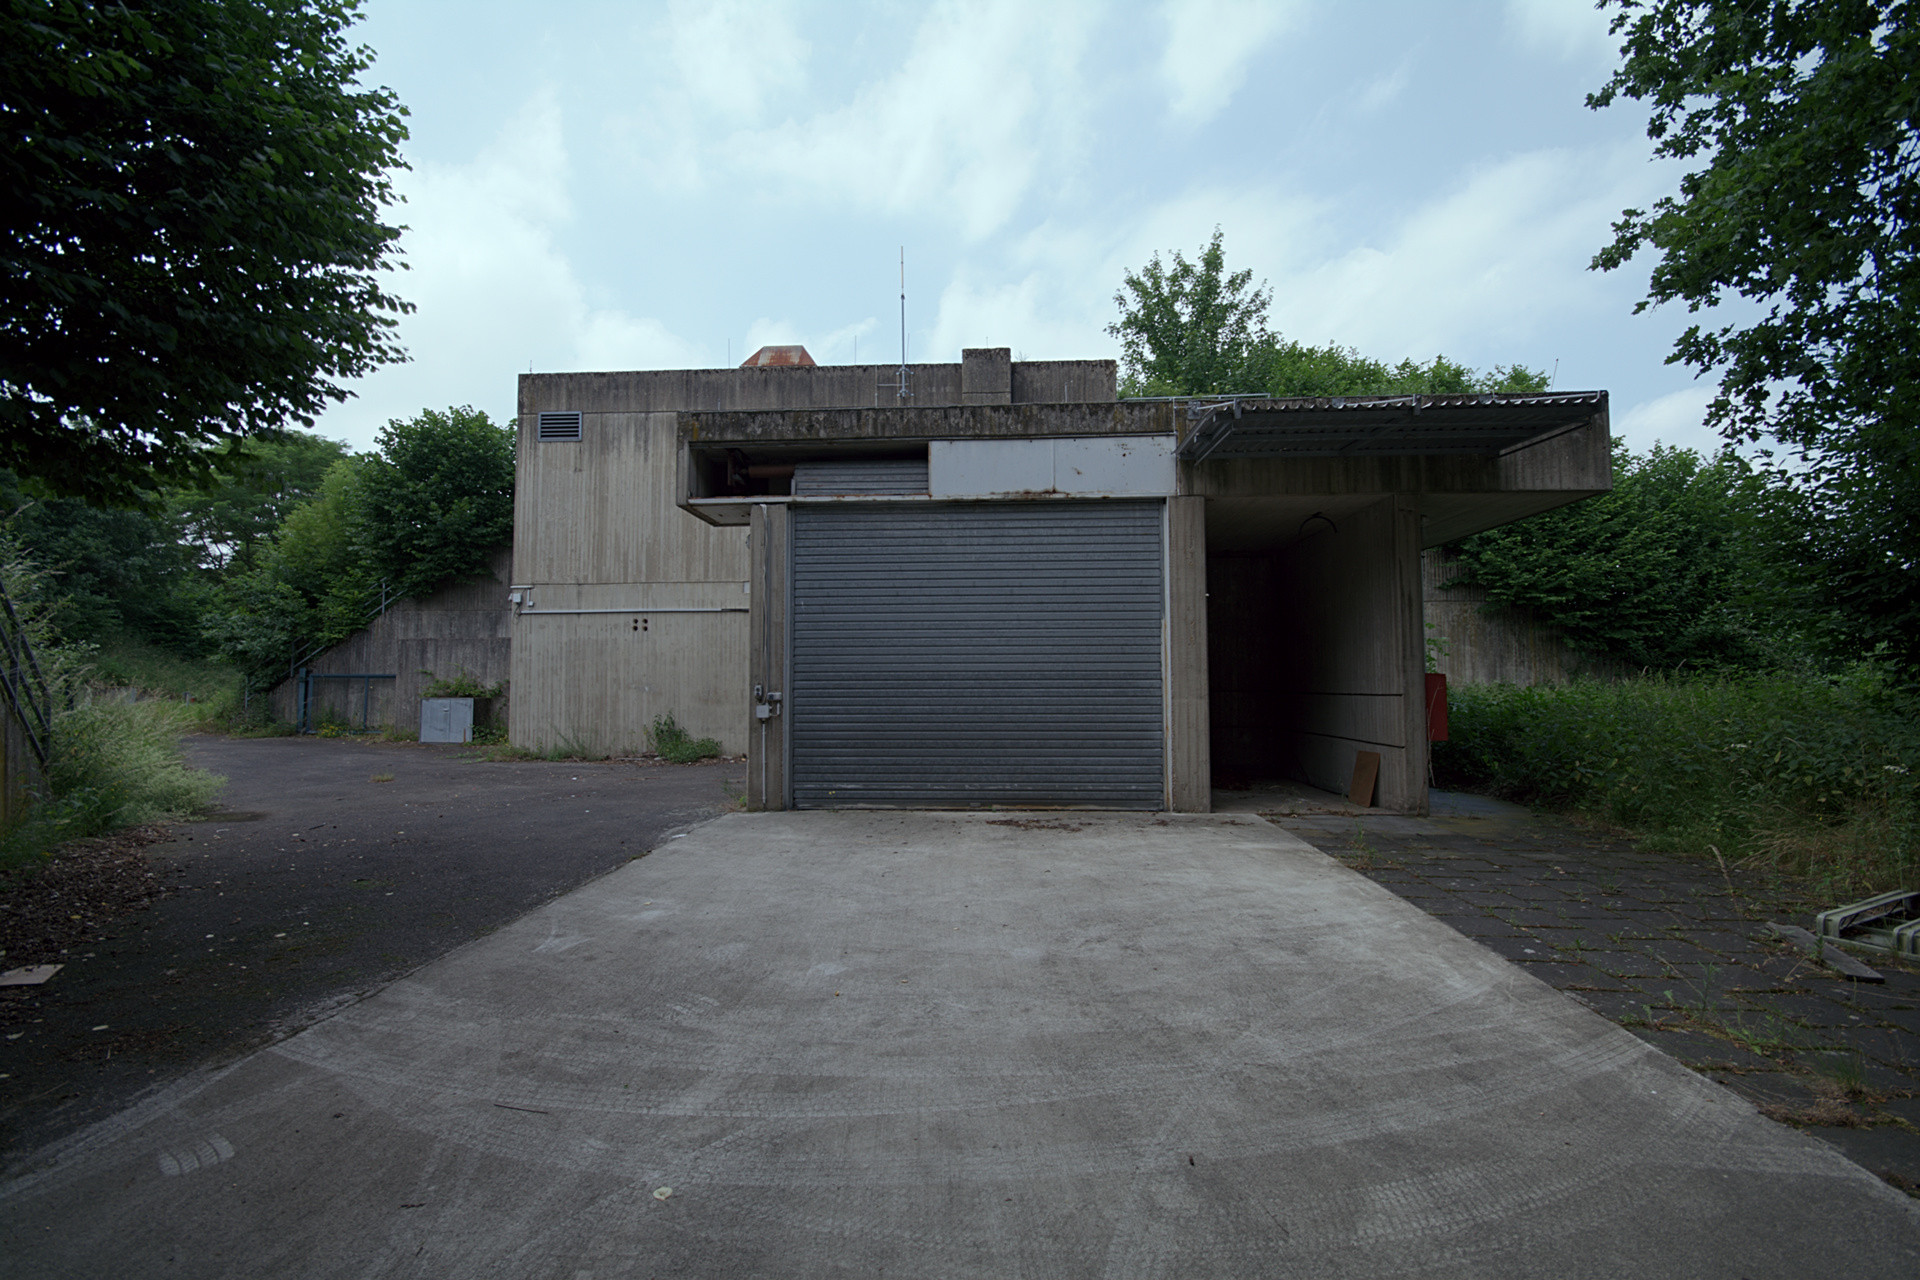 1280 #317E9A Garage Door White Mesa Gallery District Noir picture/photo Everything Garage Doors 37291920